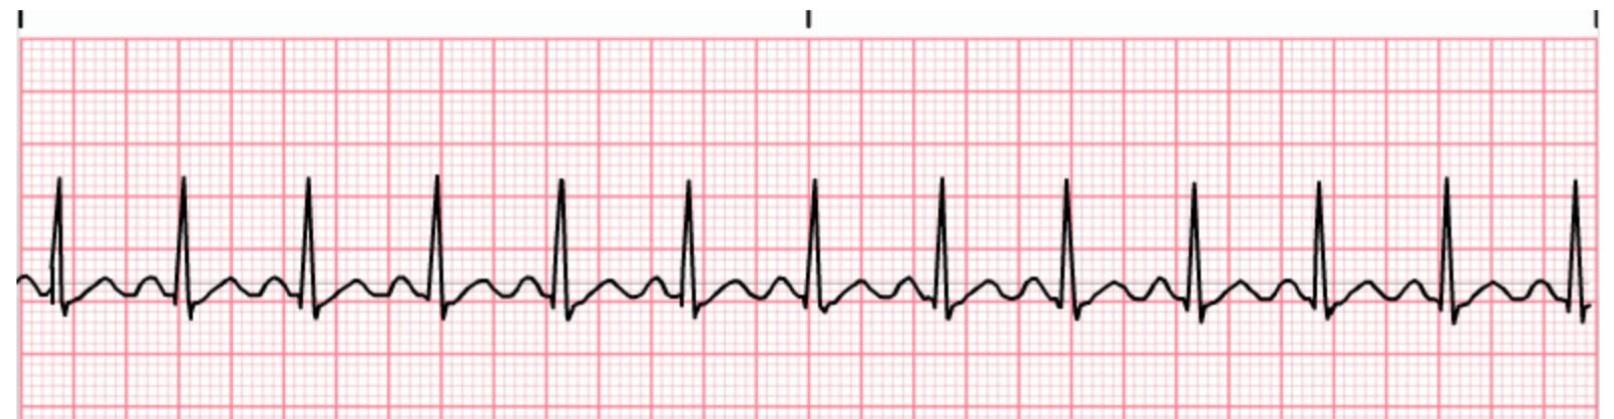 Sinus Tachycardia ECG